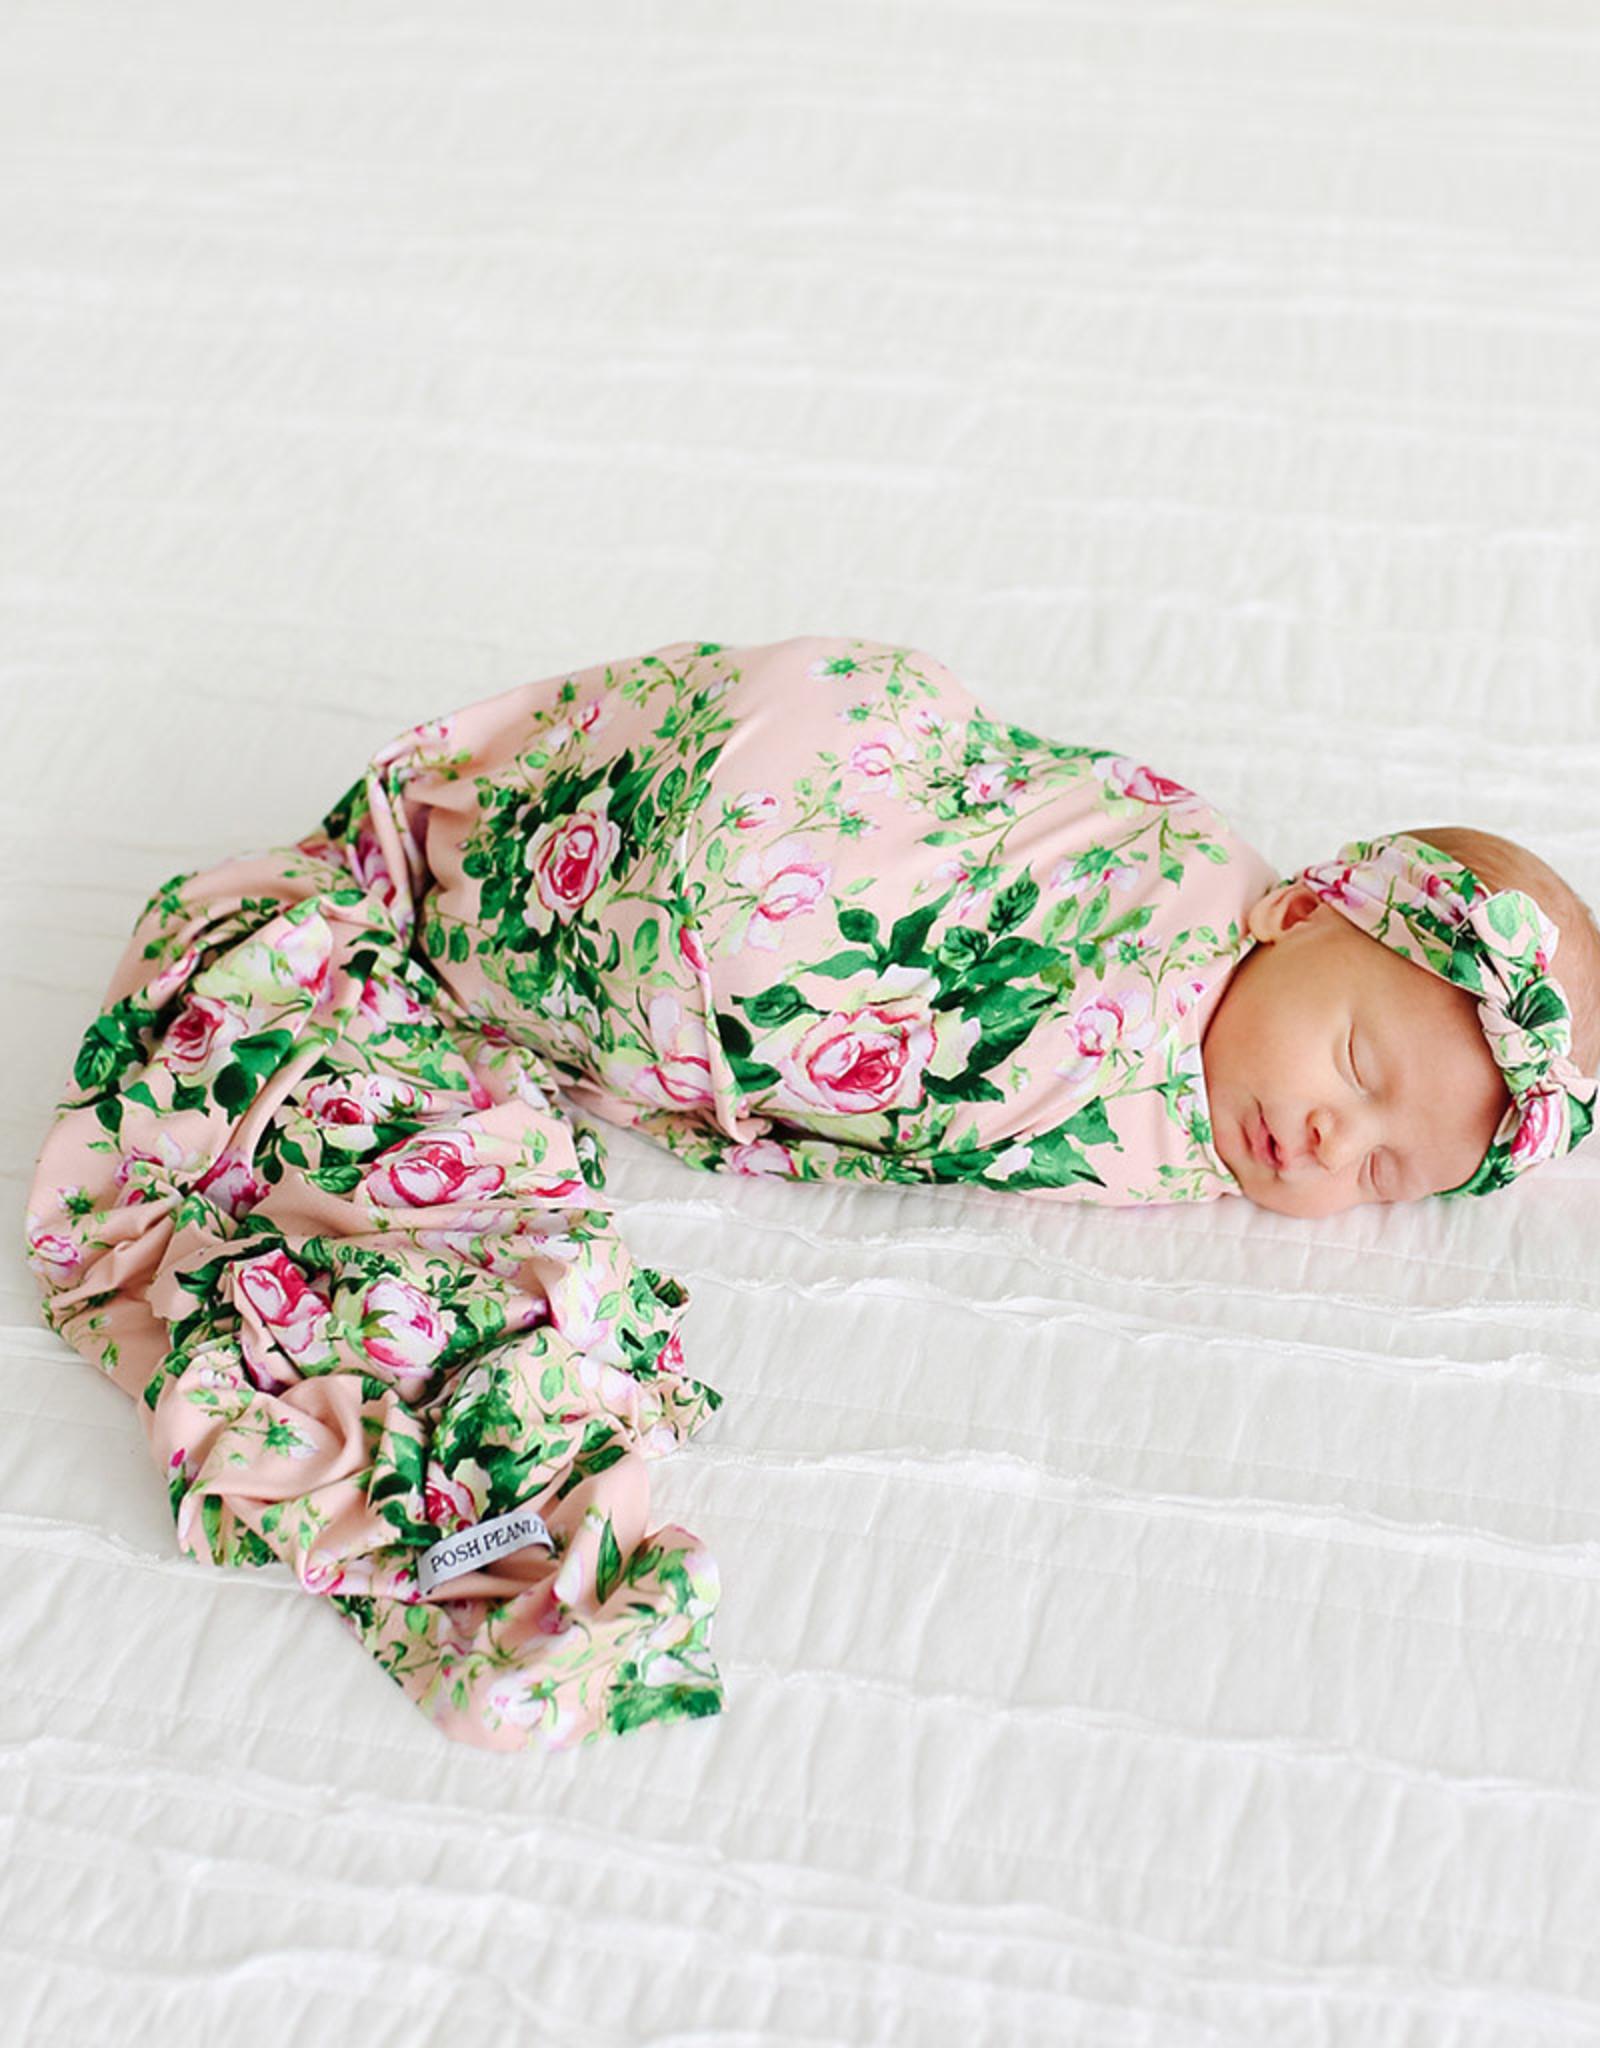 POSH PEANUT RENIA - INFANT SWADDLE AND HEADWRAP SET